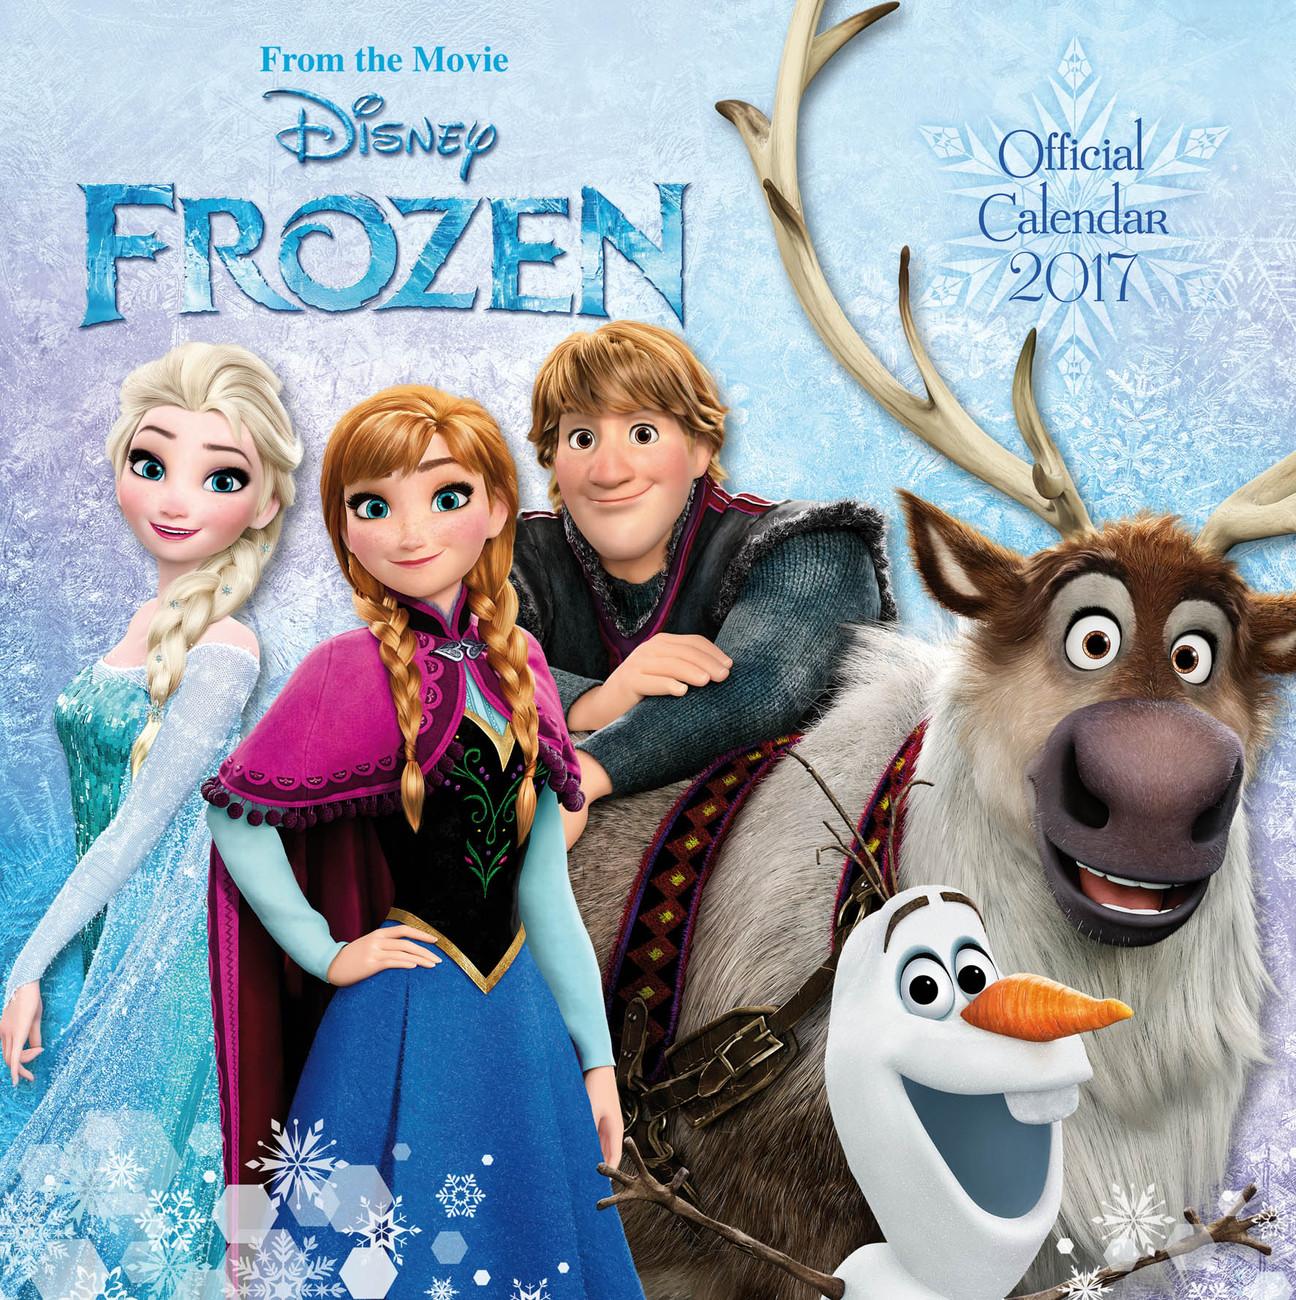 Disney - Frozen - Calendars 2018 on Abposters.com